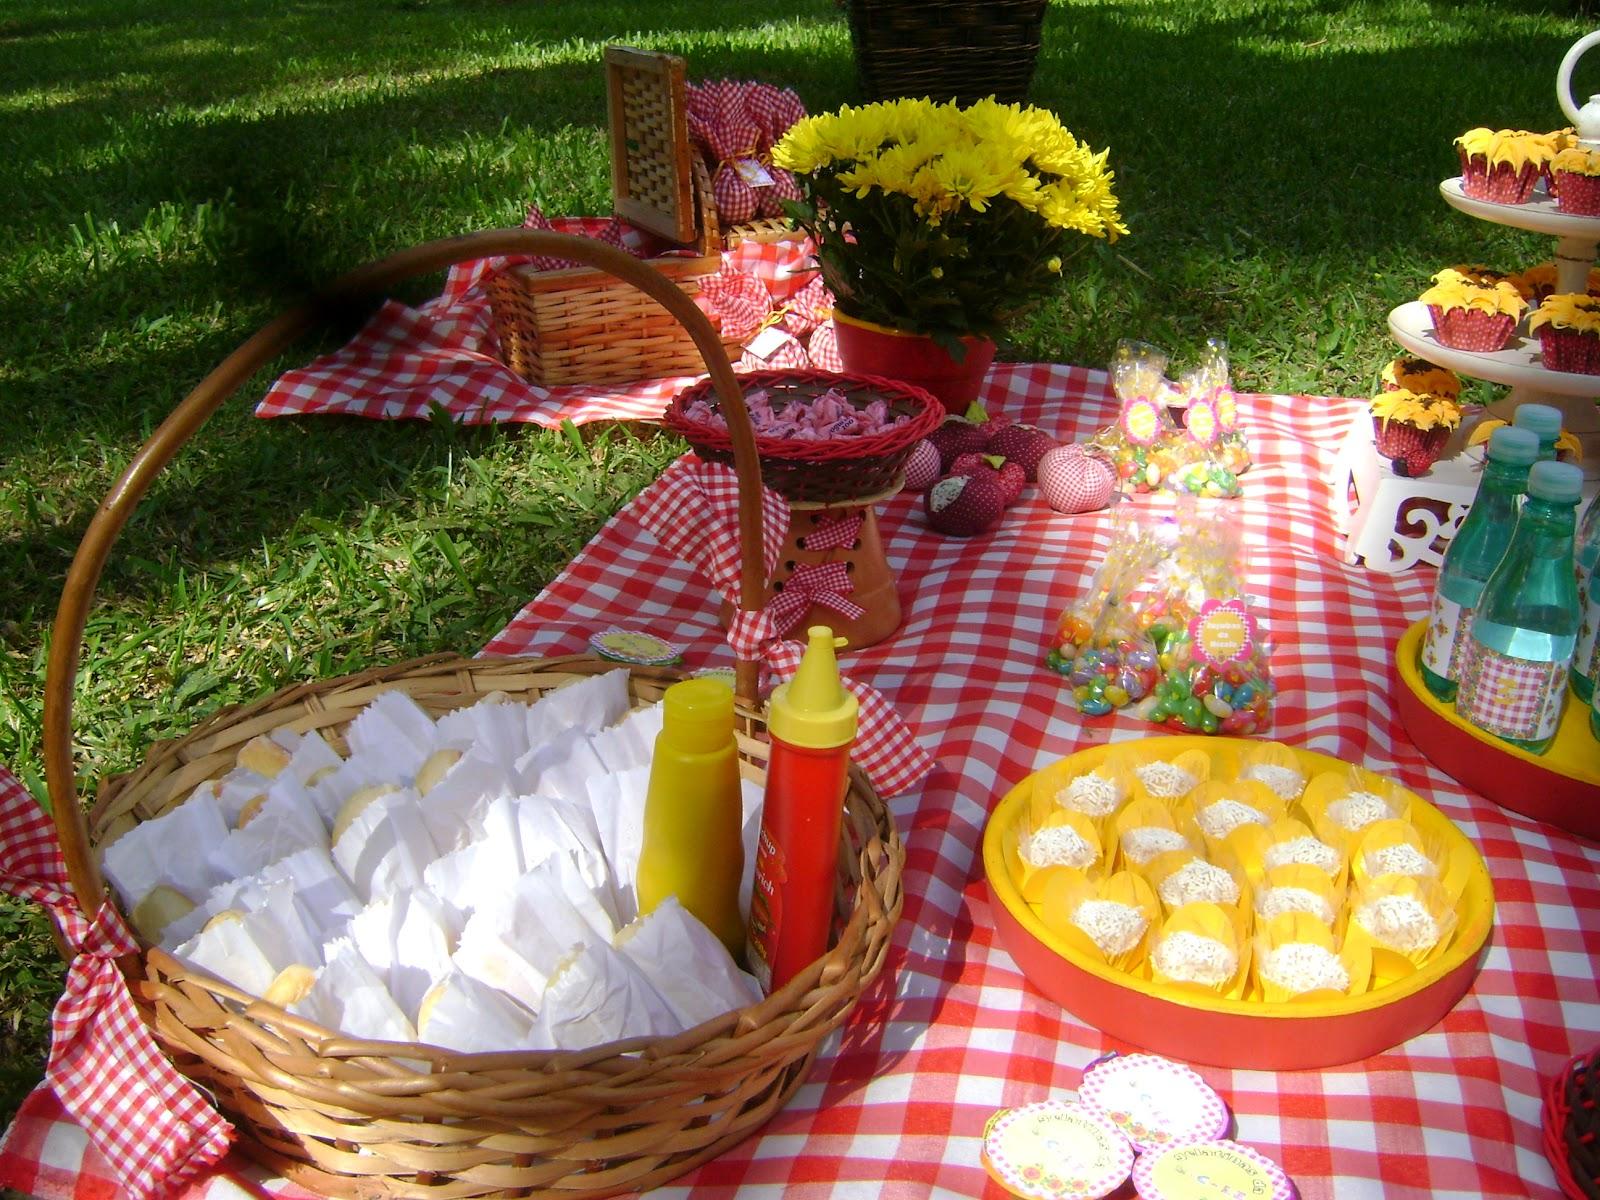 festa jardim botanico:Festa de Casa: Pic Nic no Jardim Botânico